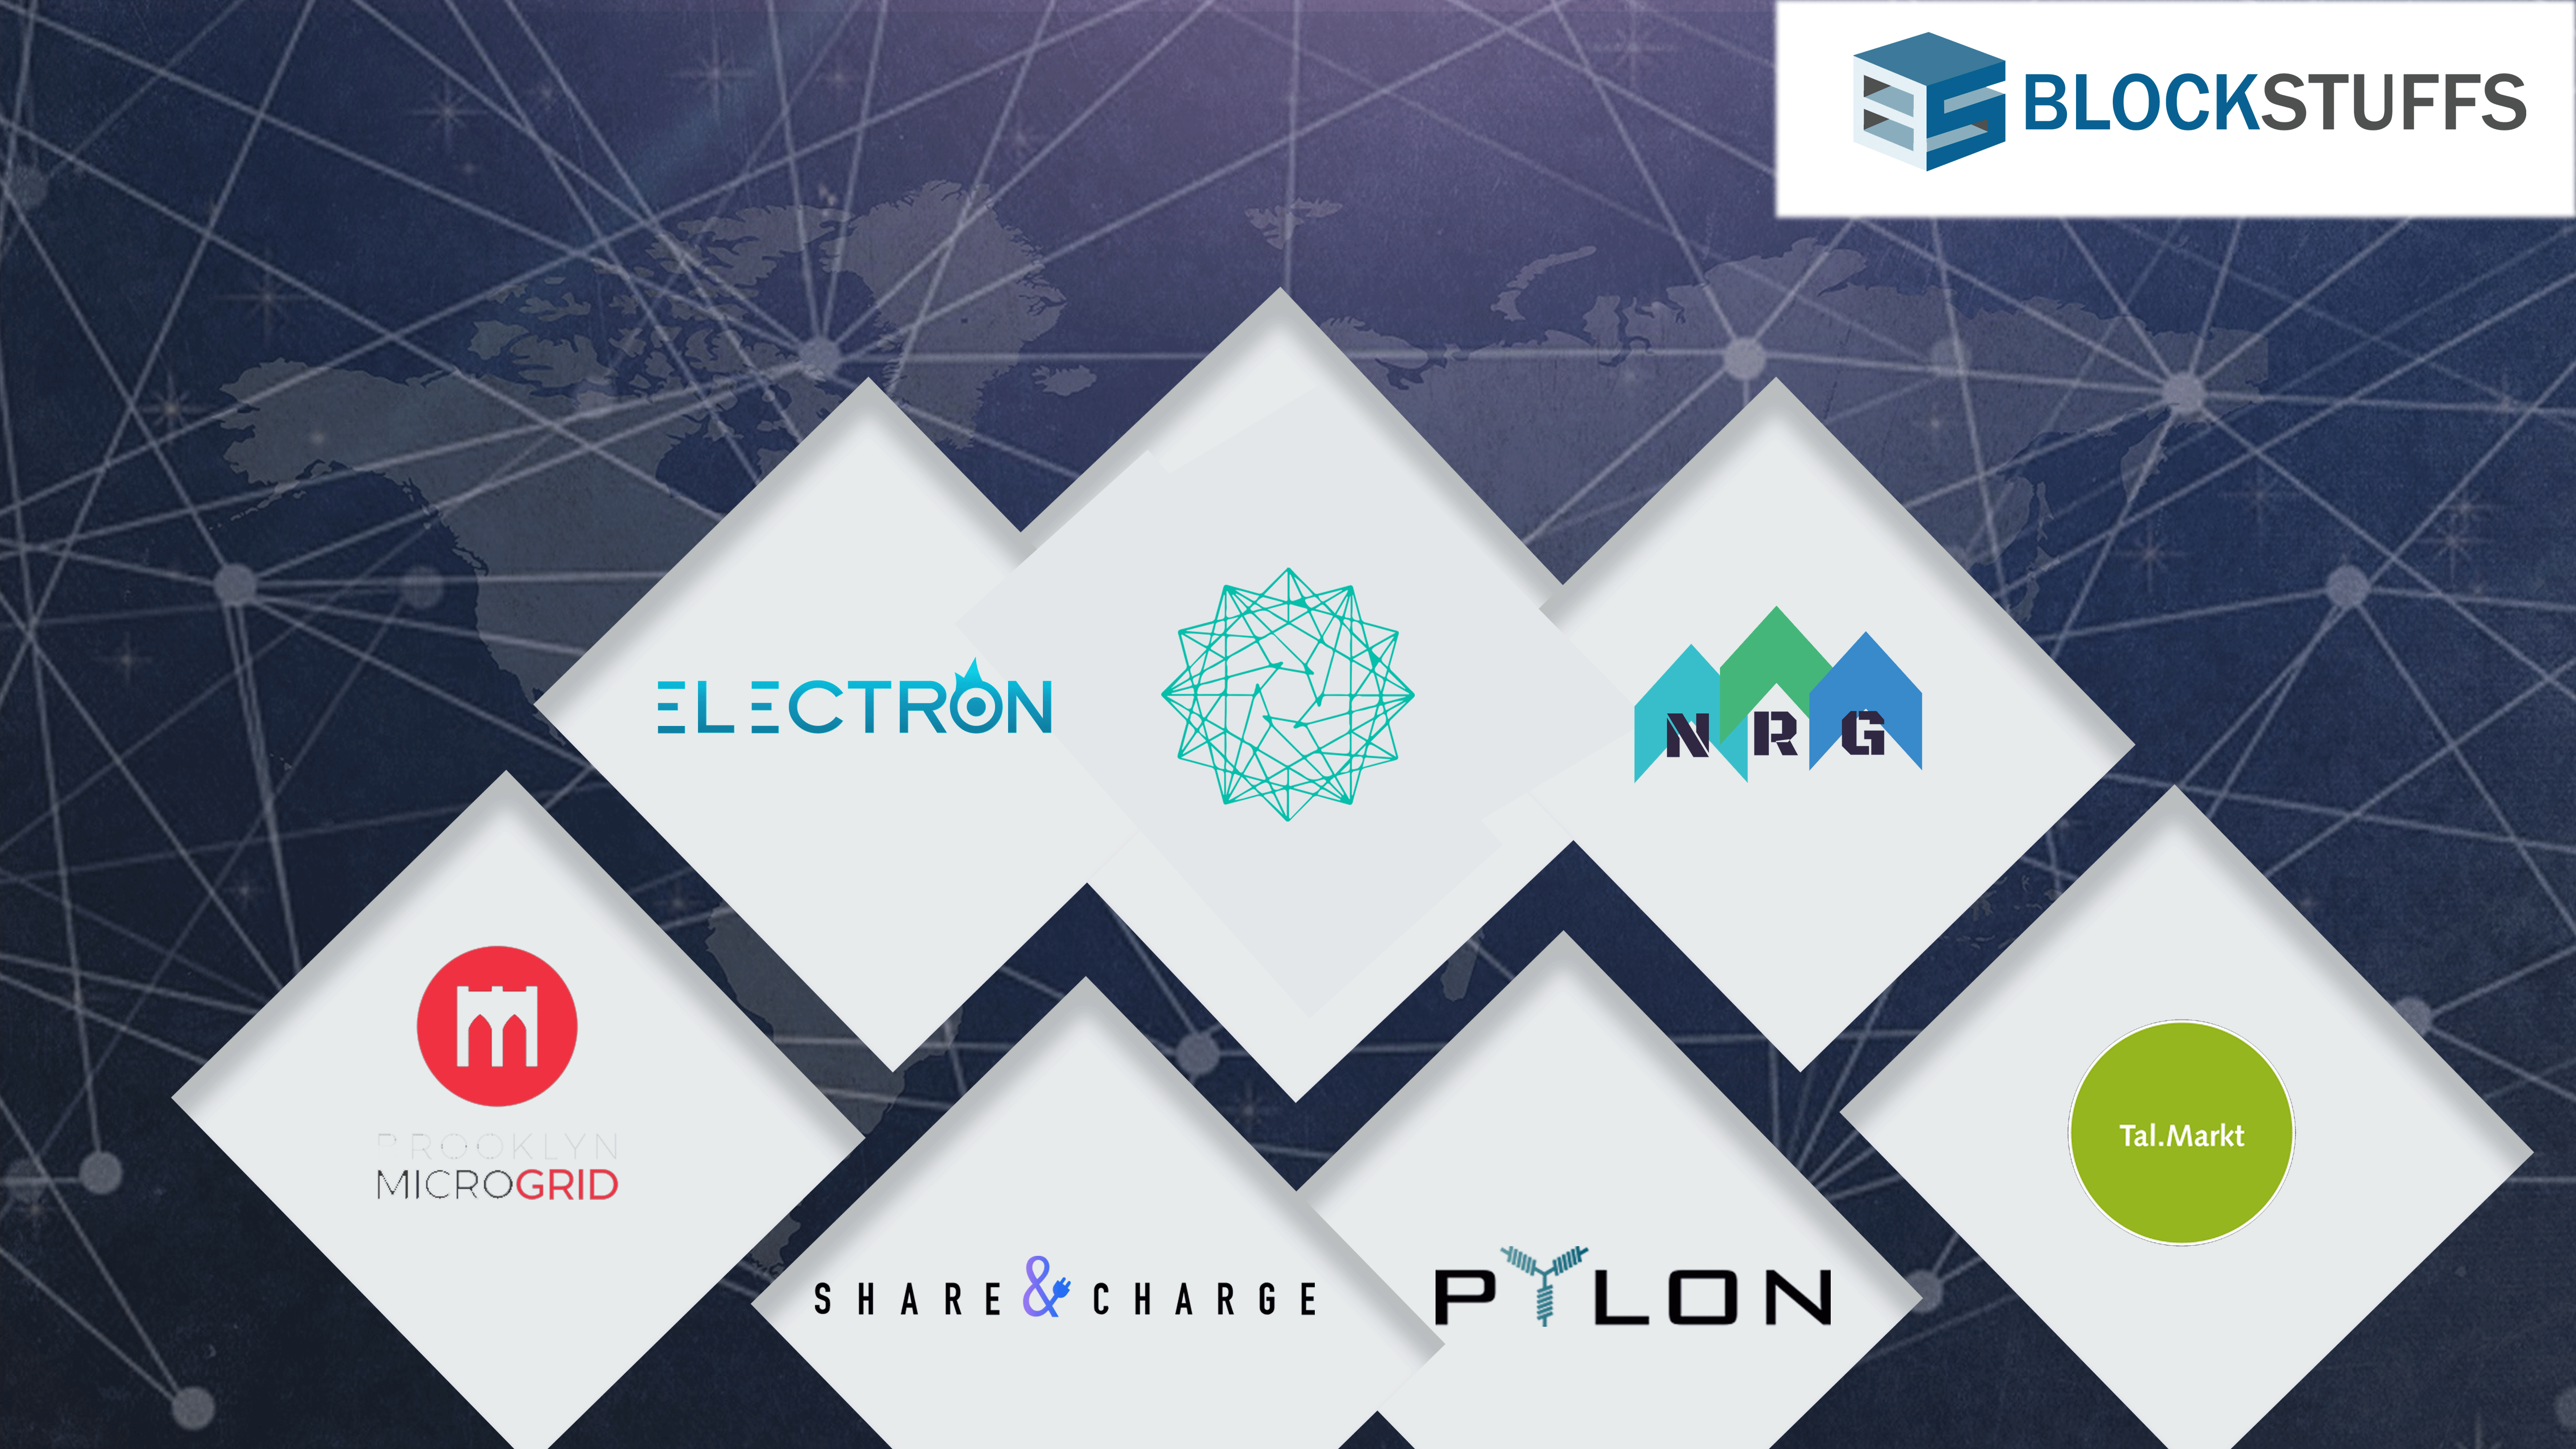 Integration of Blockchain and Energy Around the World